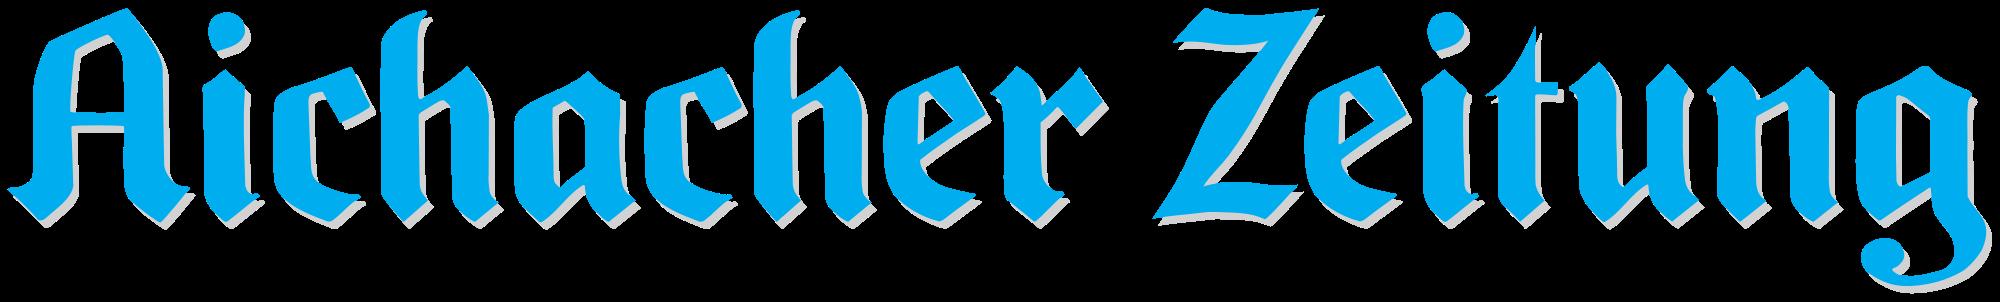 Aichacher_Zeitung